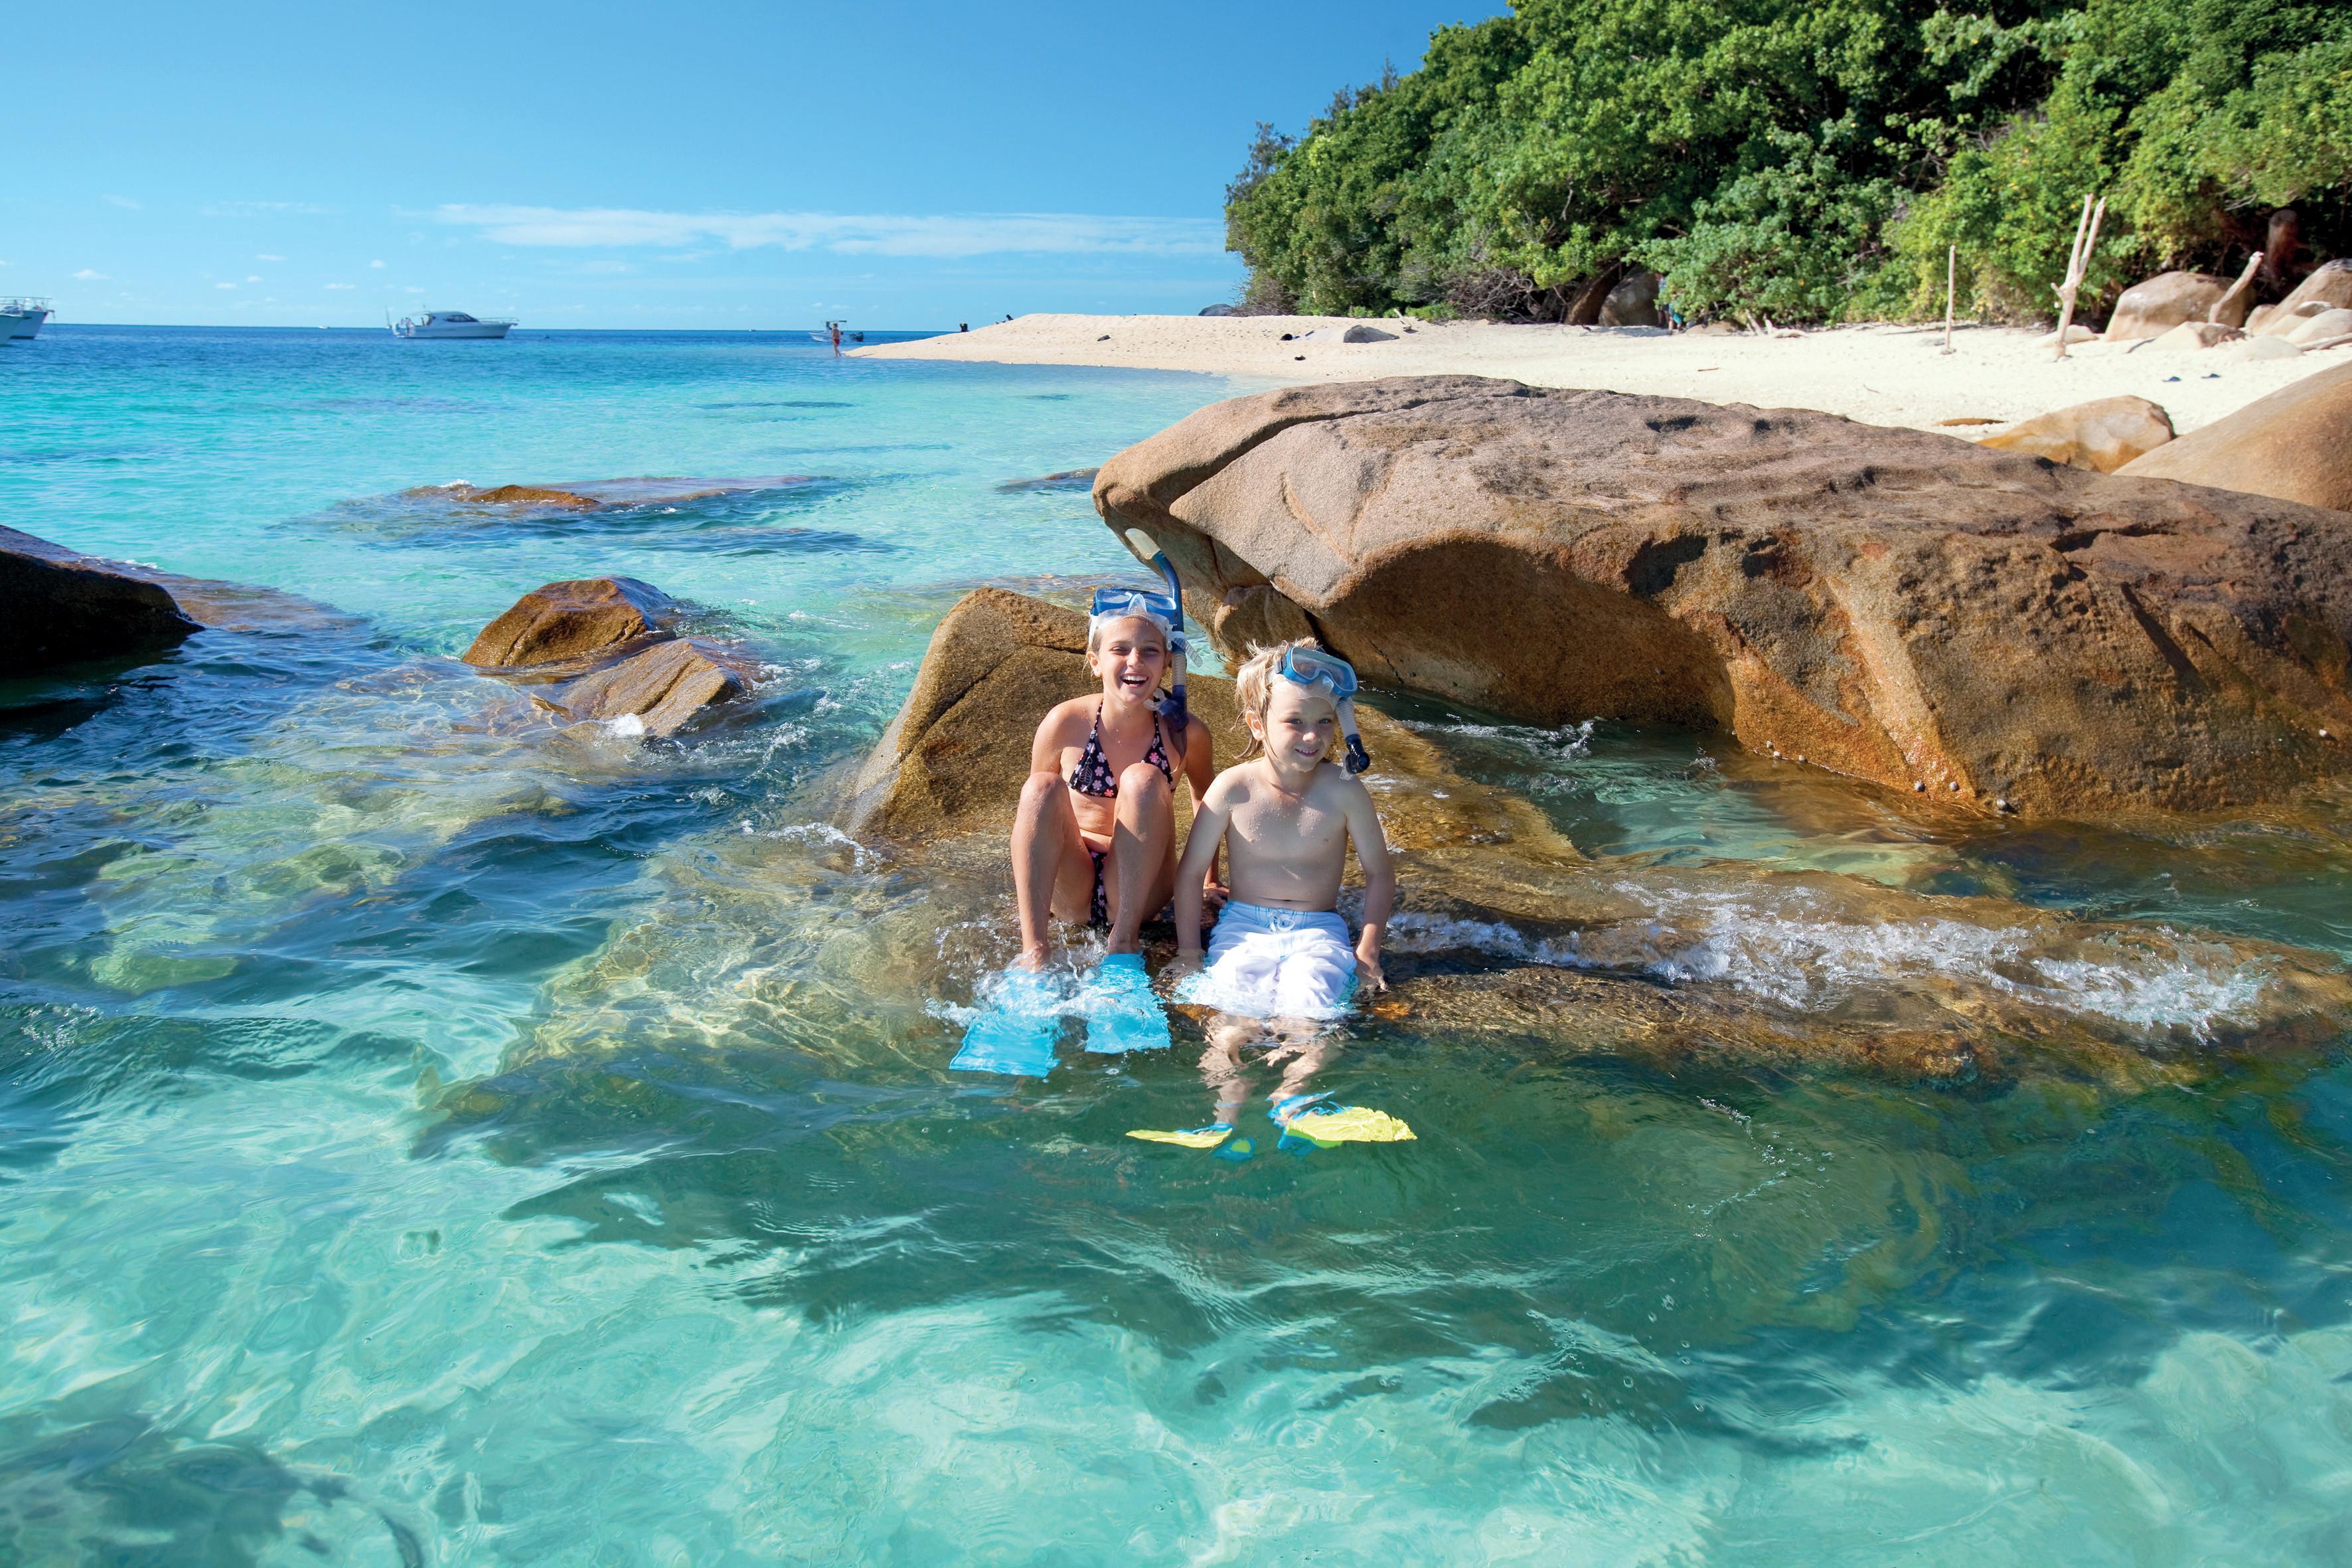 Family-friendly snorkelling fun